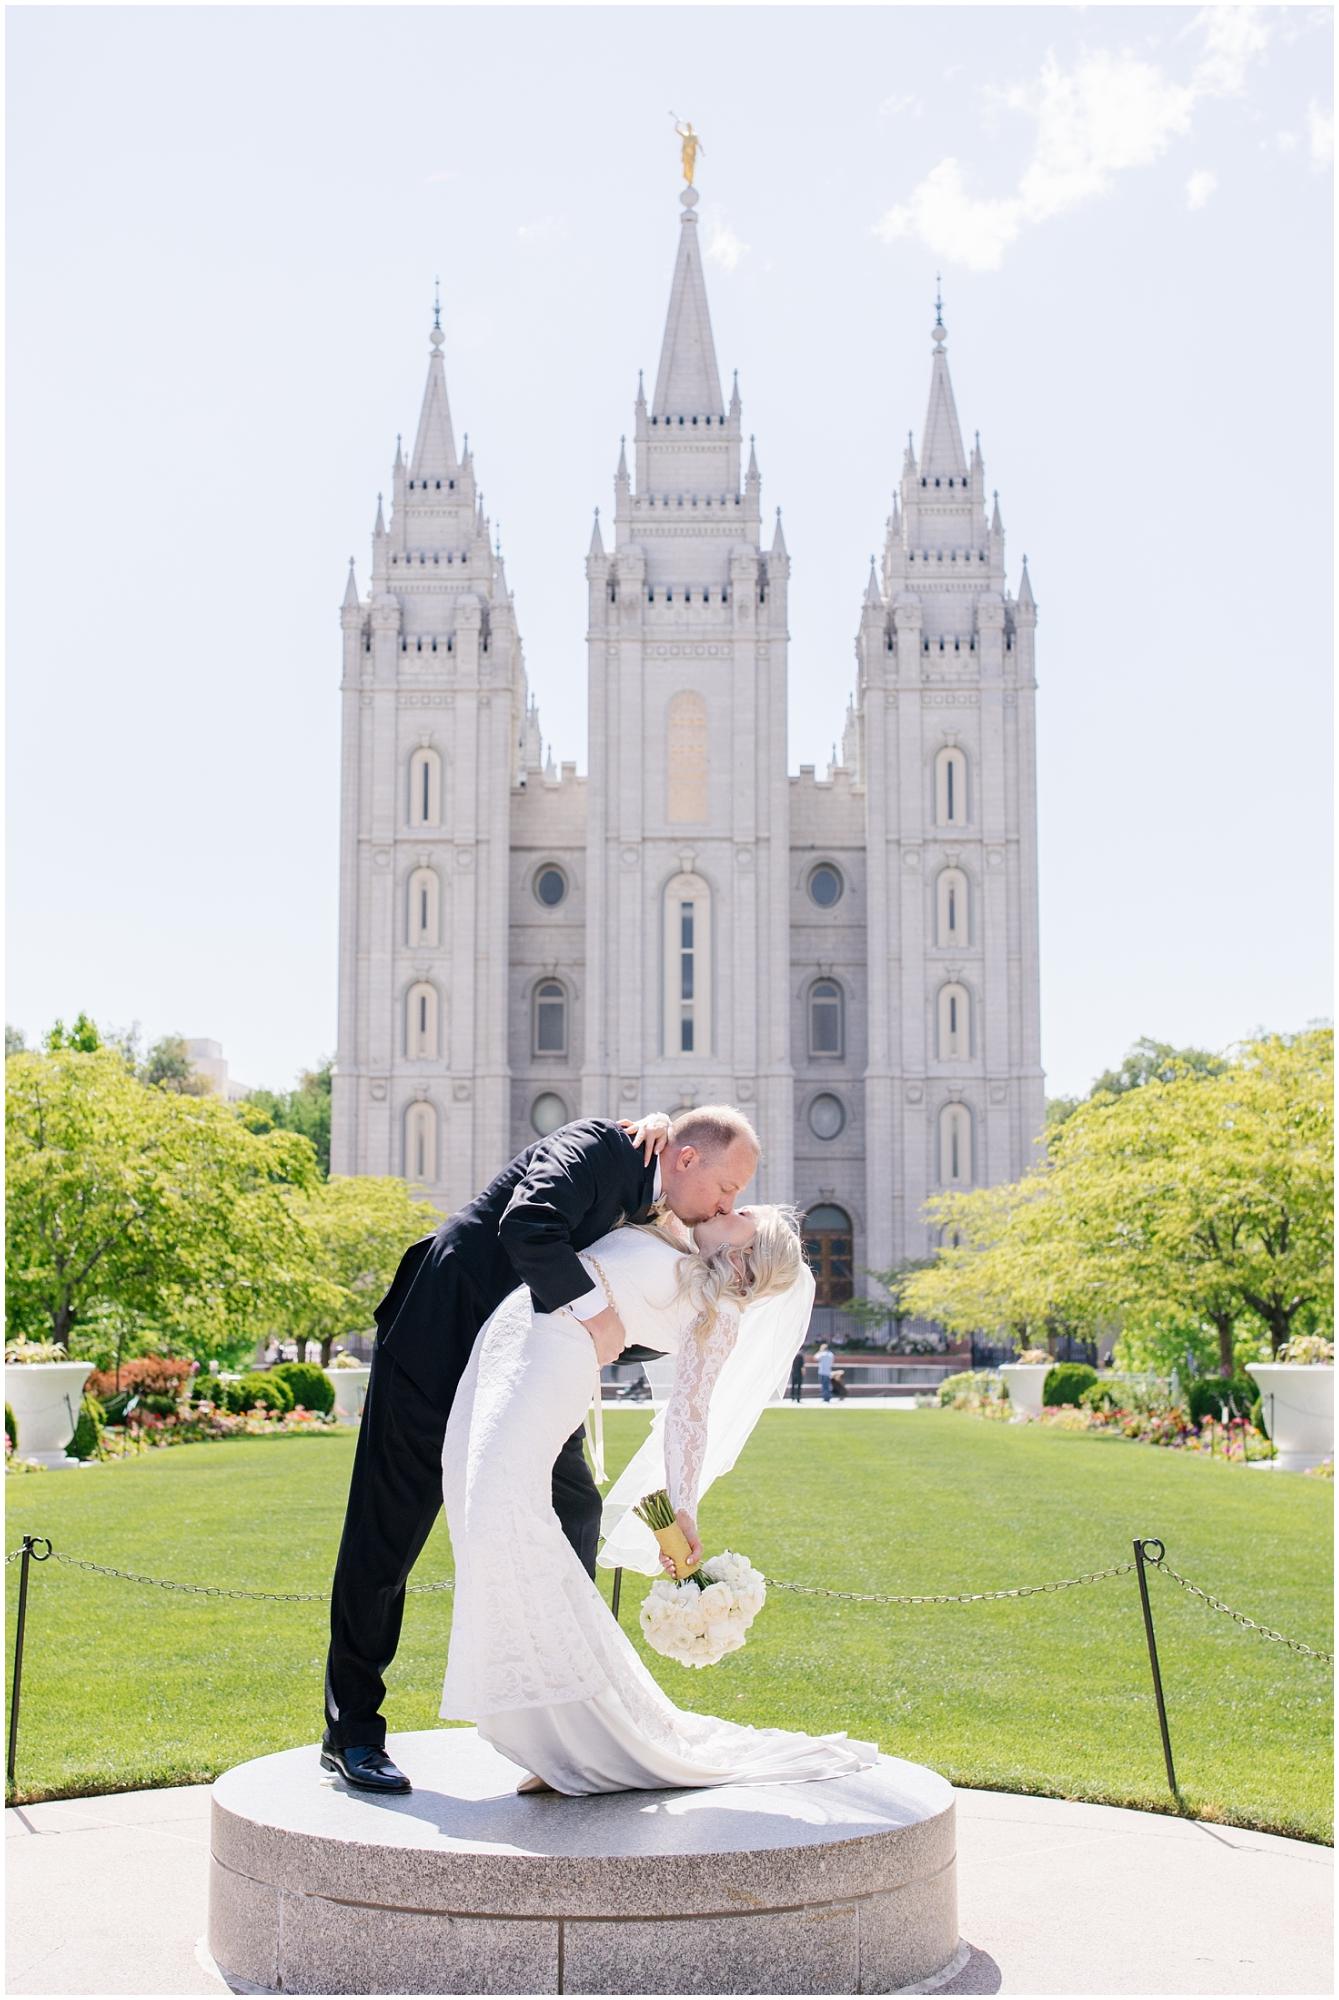 CherylandTyler-310_Lizzie-B-Imagery-Utah-Wedding-Photographer-Park-City-Salt-Lake-City-Temple-Wells-Fargo-Building.jpg